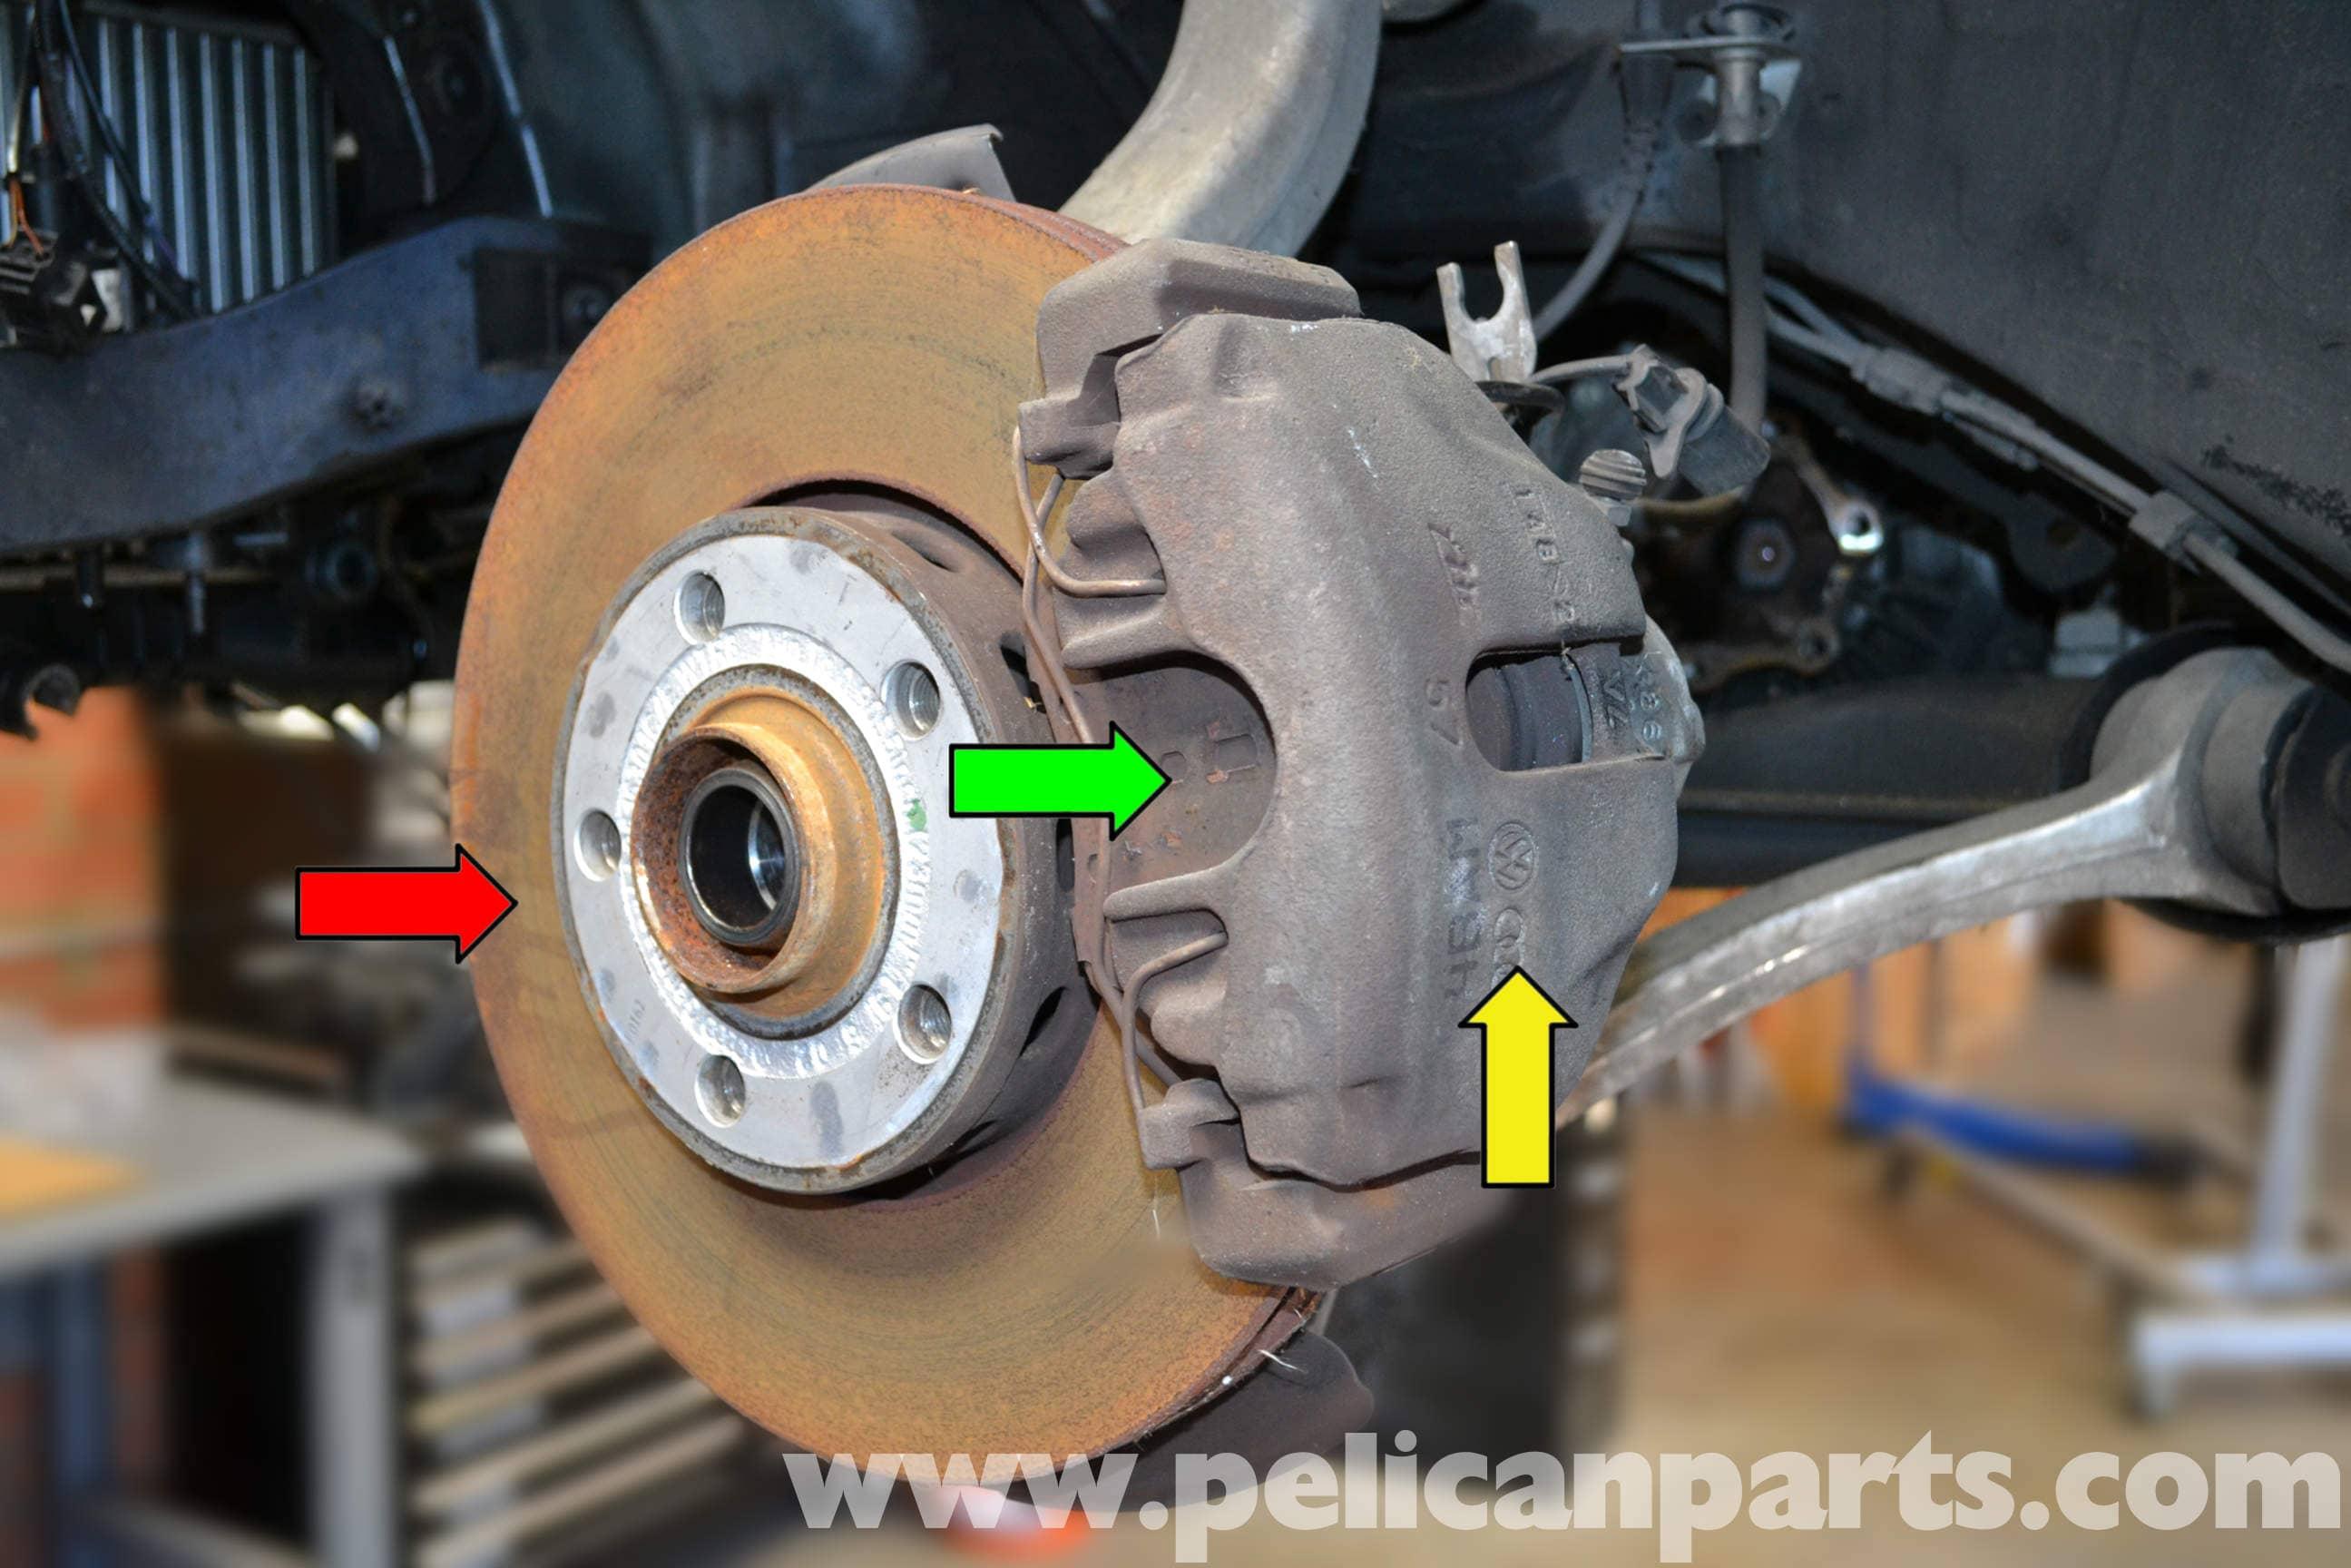 audi a4 b6 front brake caliper replacement 2002 2008 pelican parts diy maintenance article. Black Bedroom Furniture Sets. Home Design Ideas